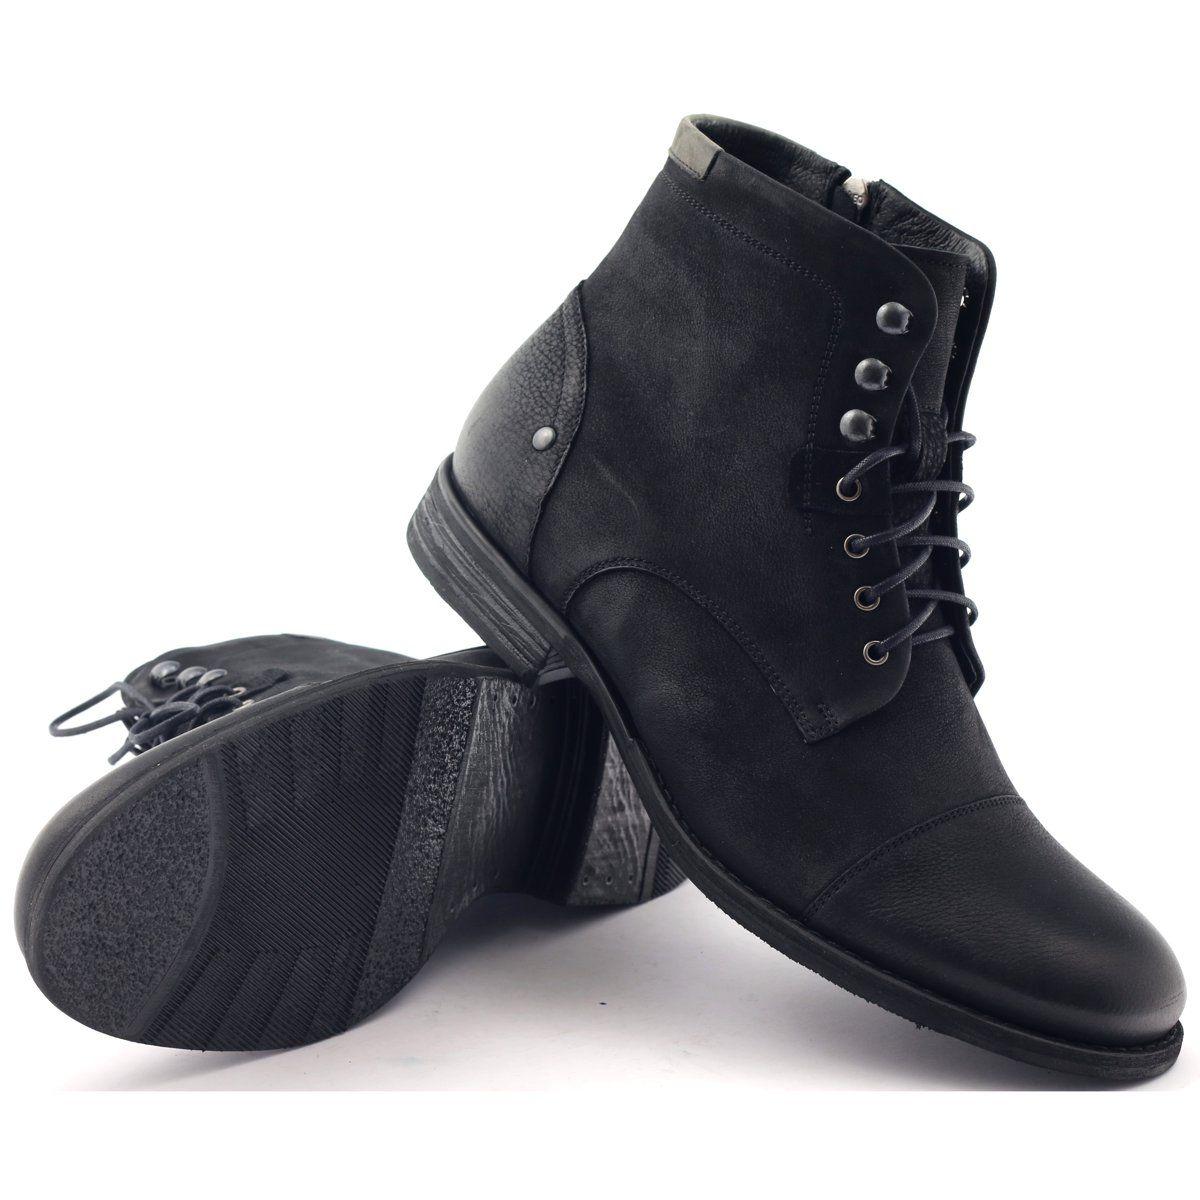 Botki Trzewiki Zimowe Pilpol C831 Czarne Boots Winter Boots Insulated Boots